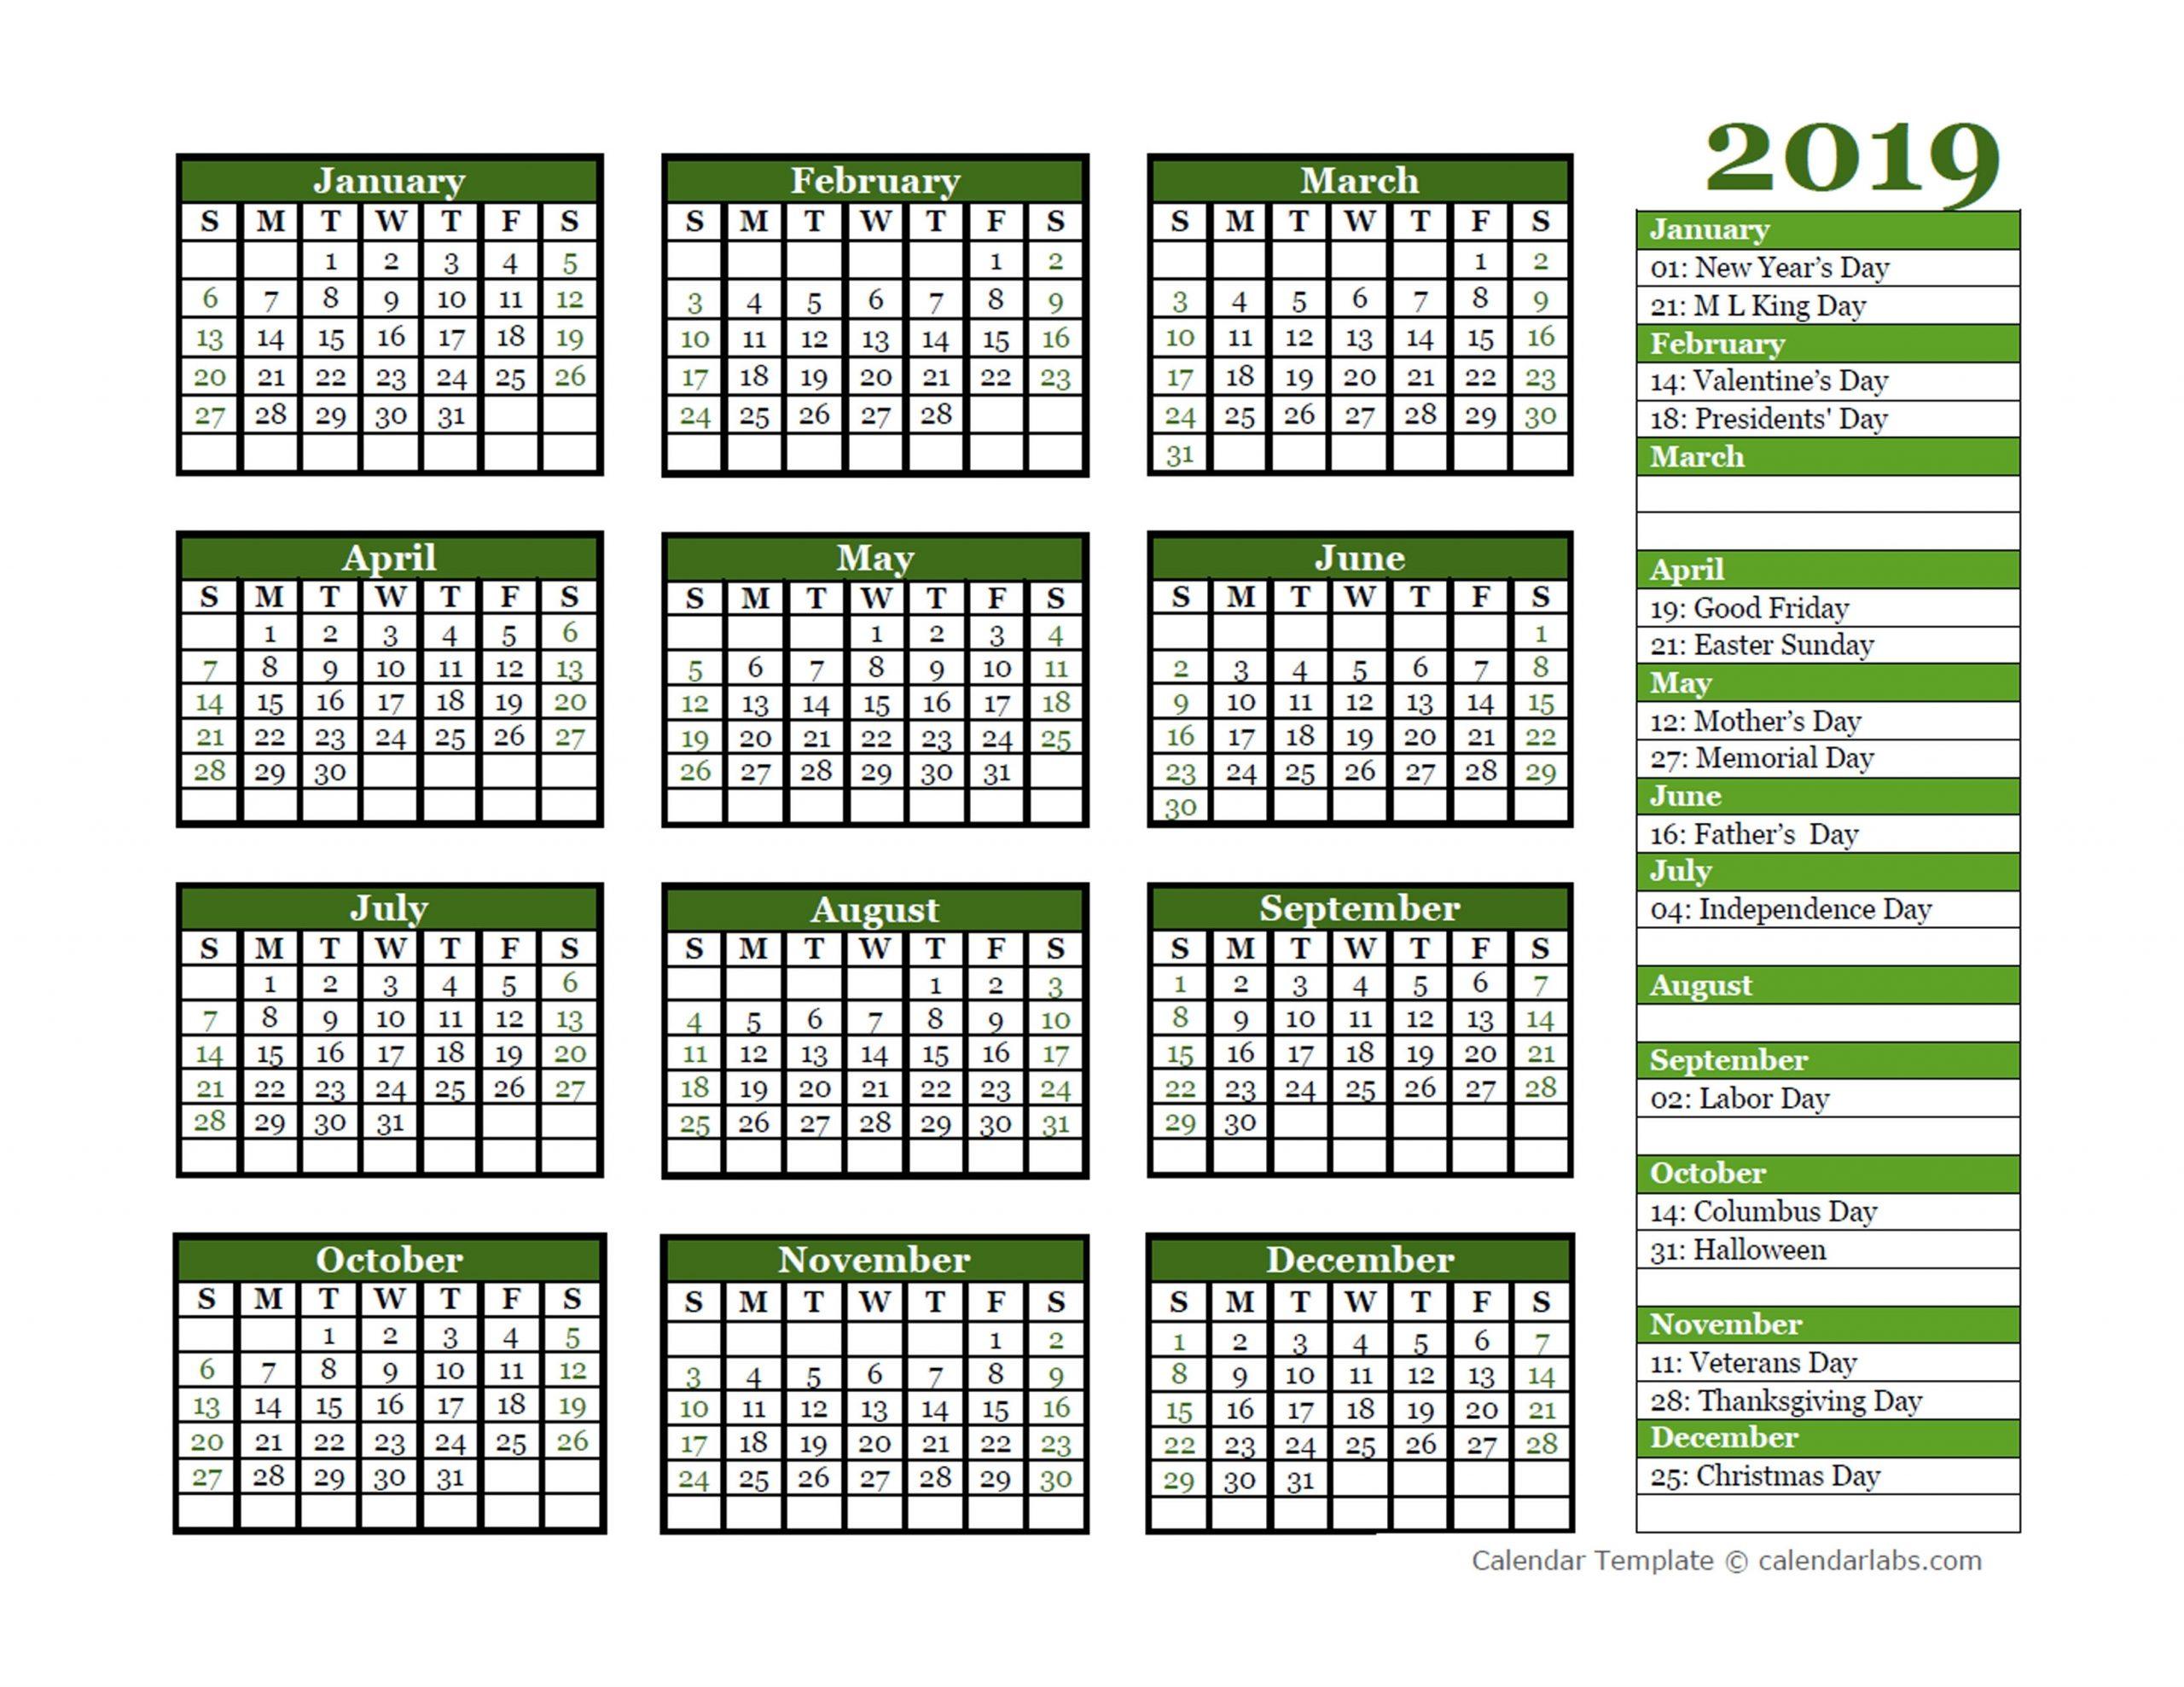 Editable 2019 Yearly Calendar Landscape - Free Printable Templates